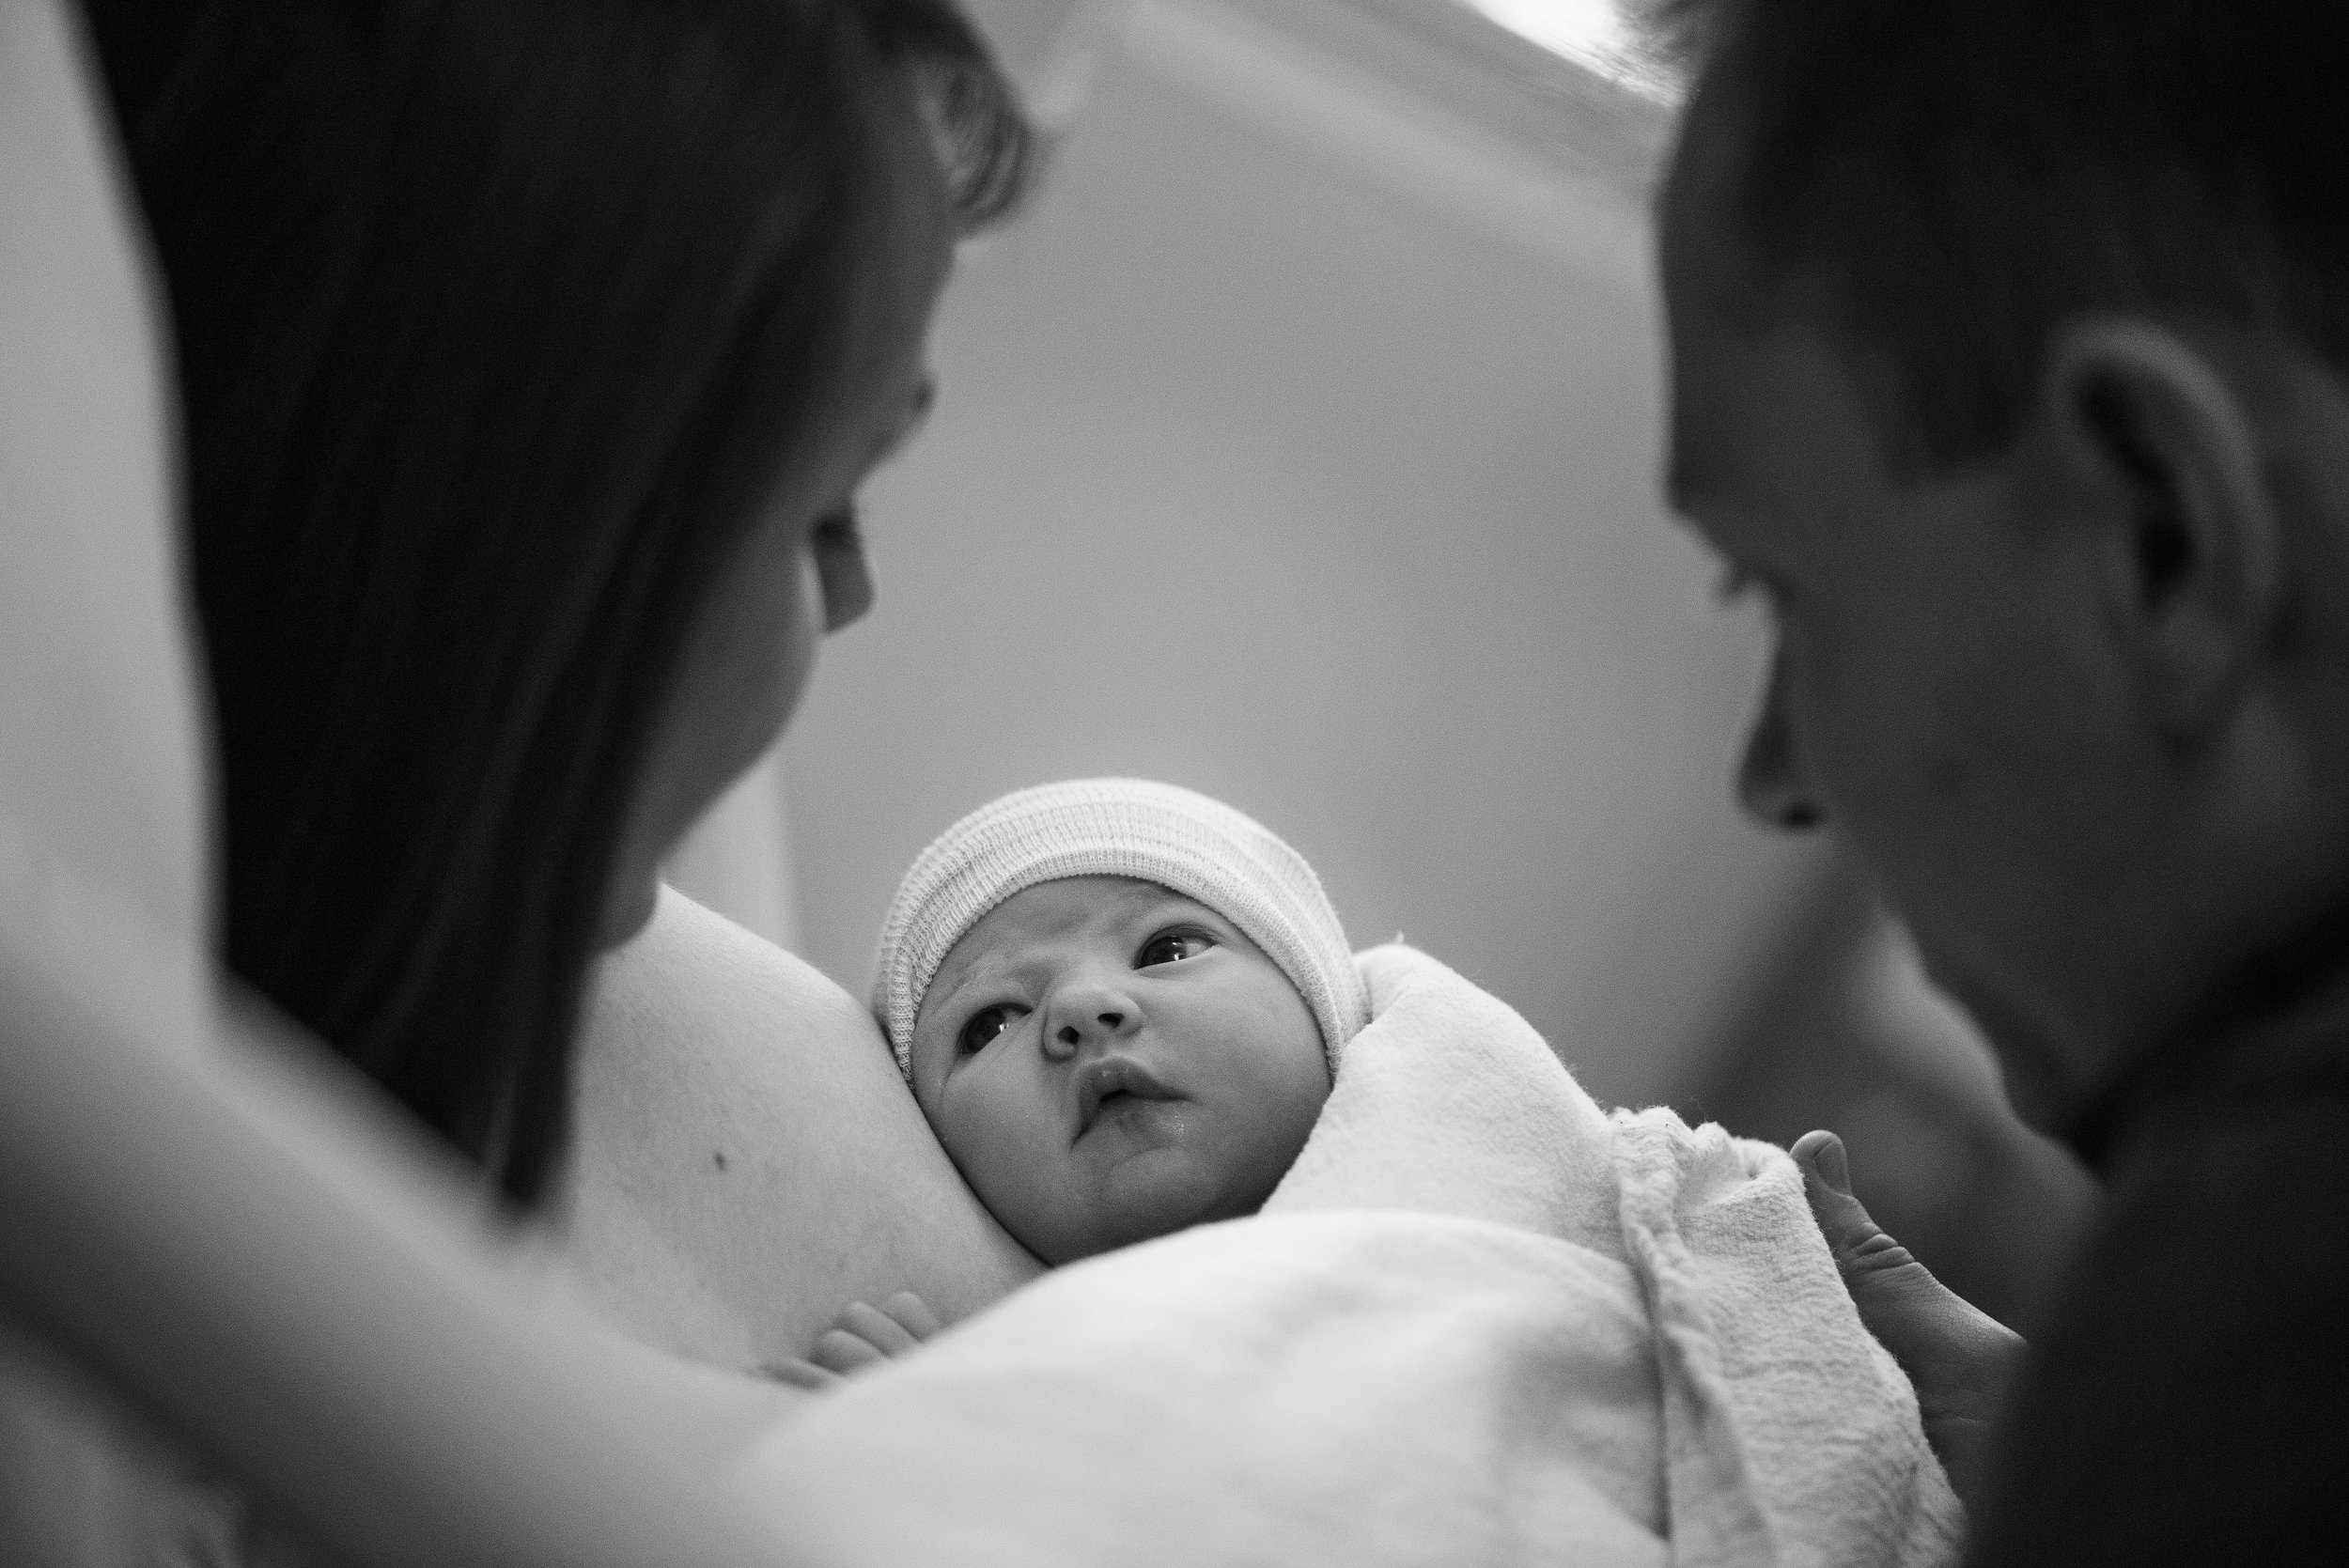 duncan-family-014-sacramento-family-birth-photographer-katherine-nicole-photography.JPG